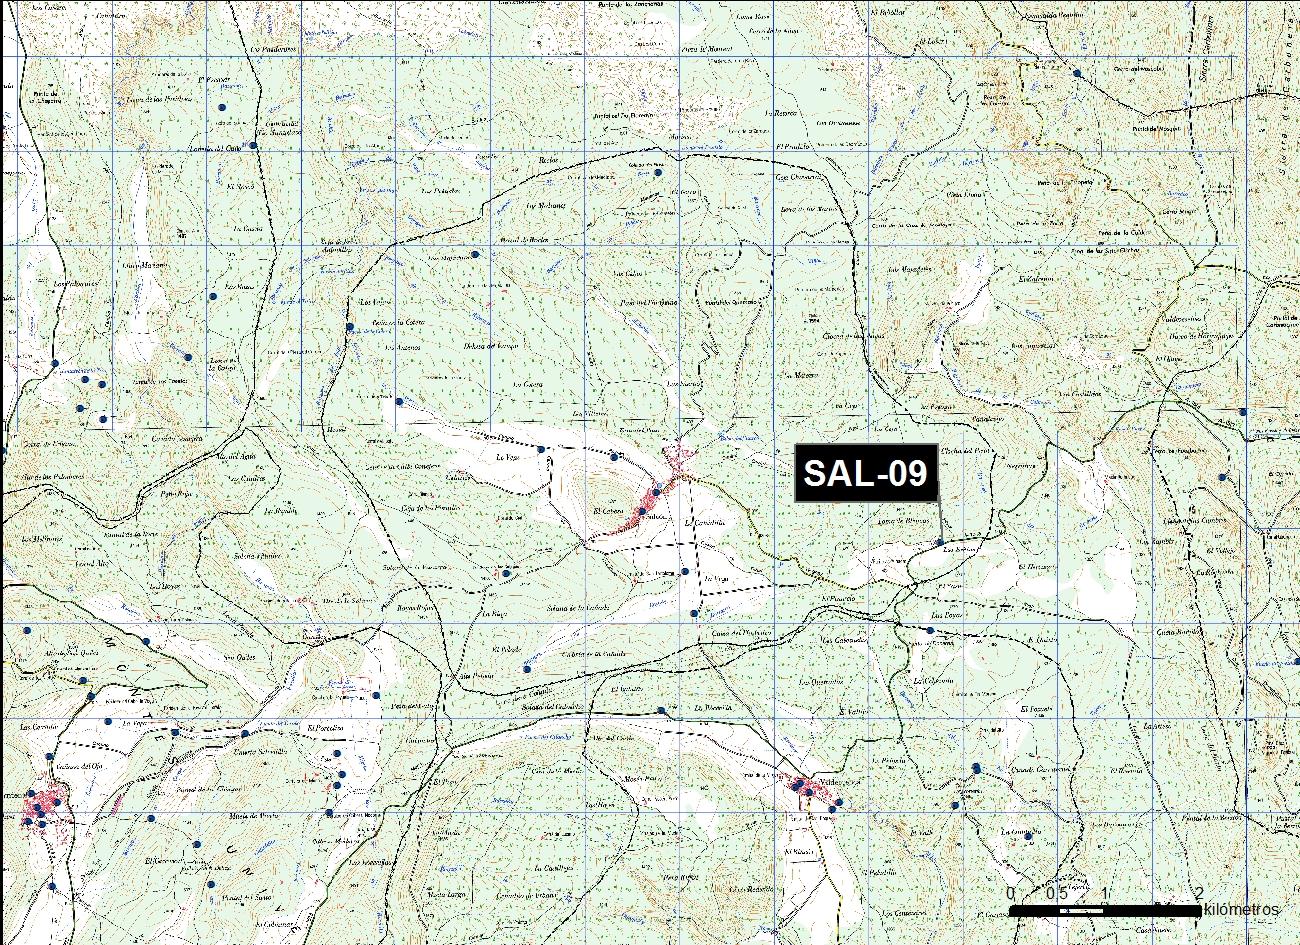 SAL_09_M.V.LOZANO_POZO HOYA CODES_MAP.TOPO 1